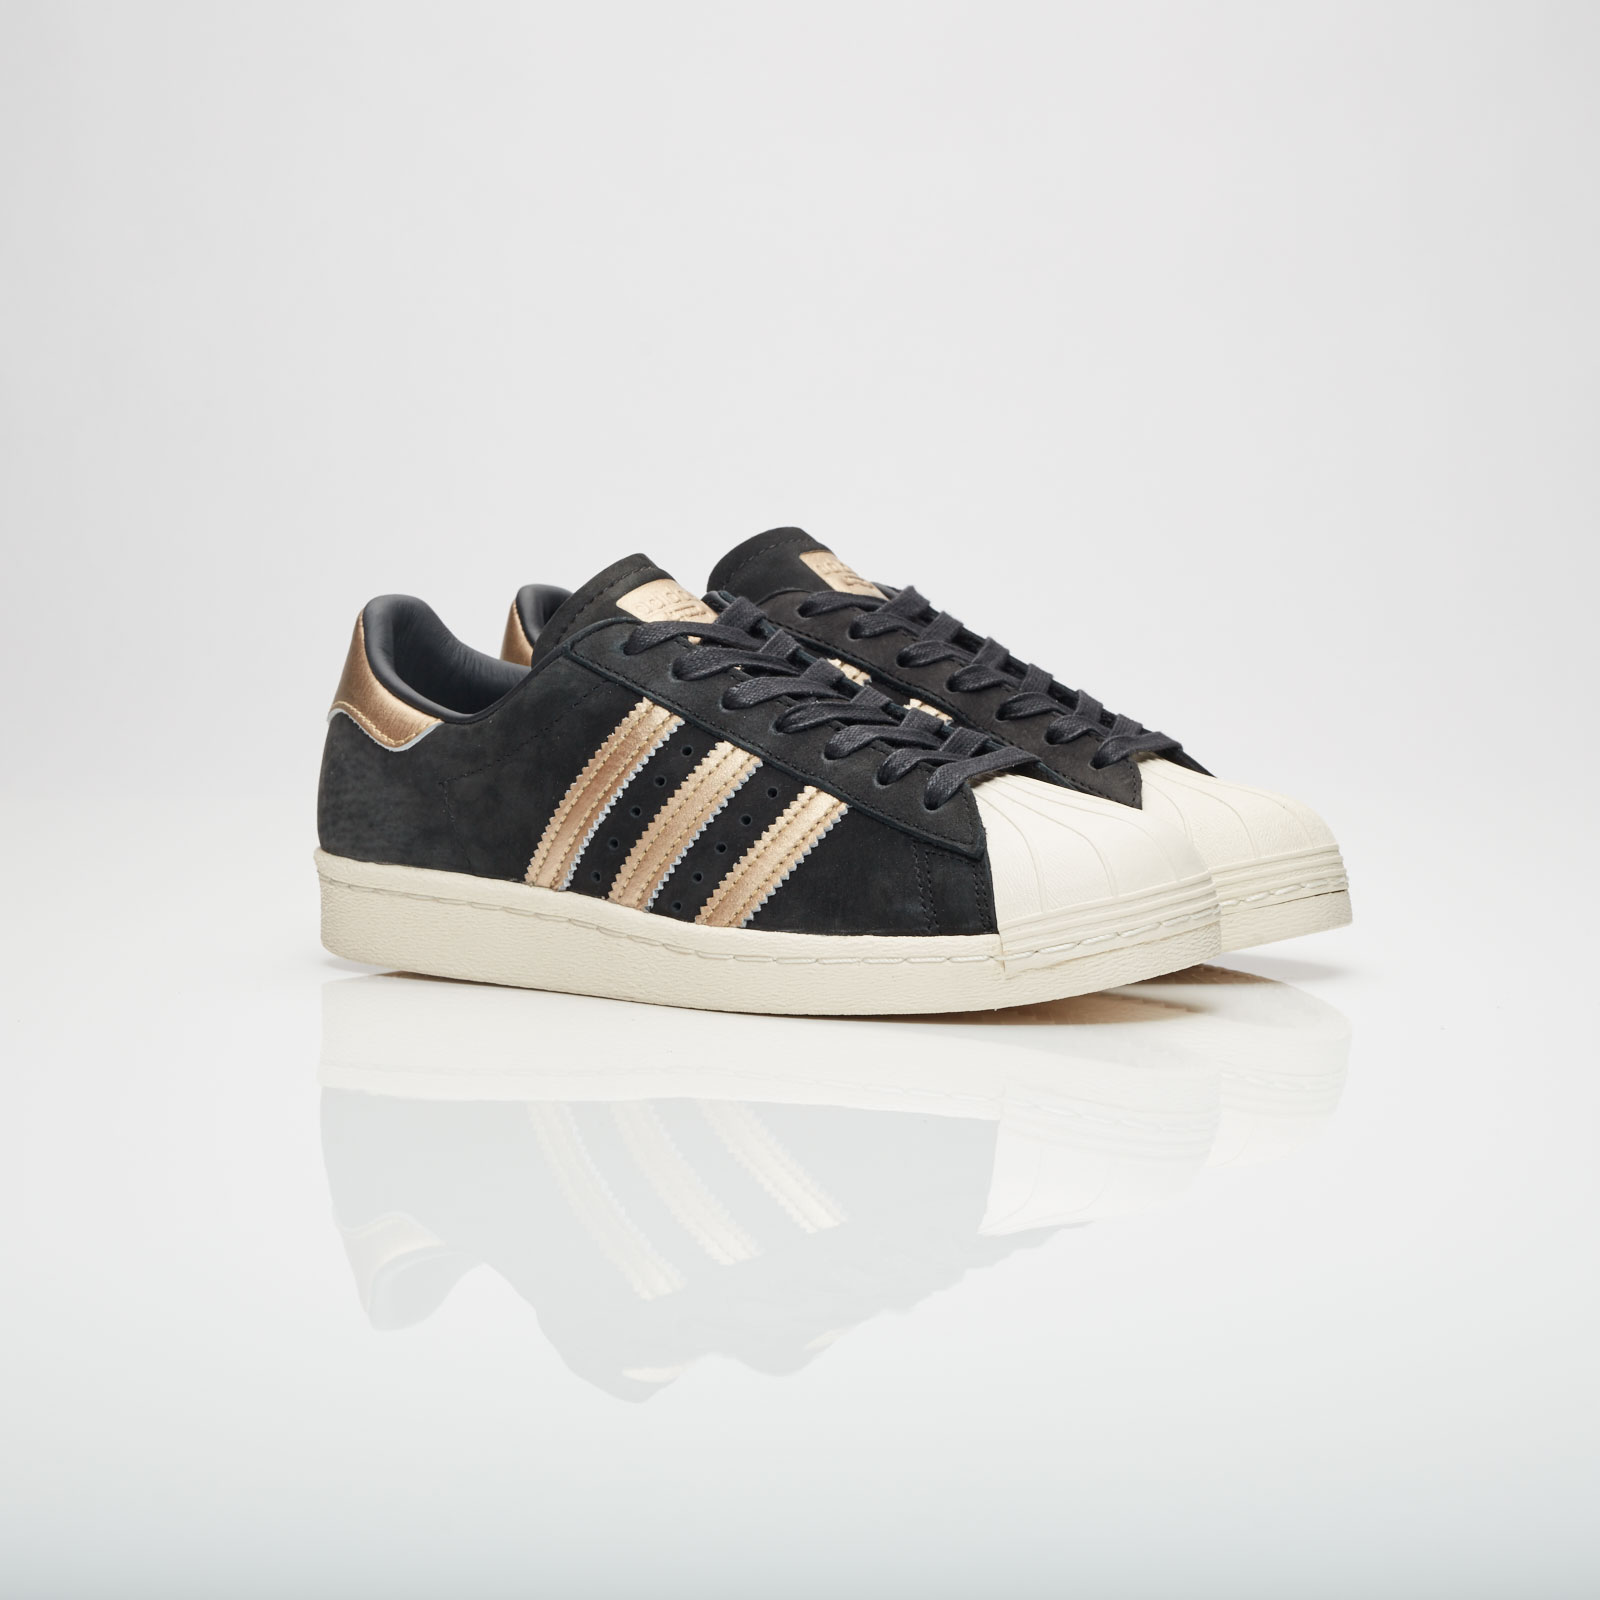 sports shoes 7a568 15982 adidas Originals Superstar 80s 999 W